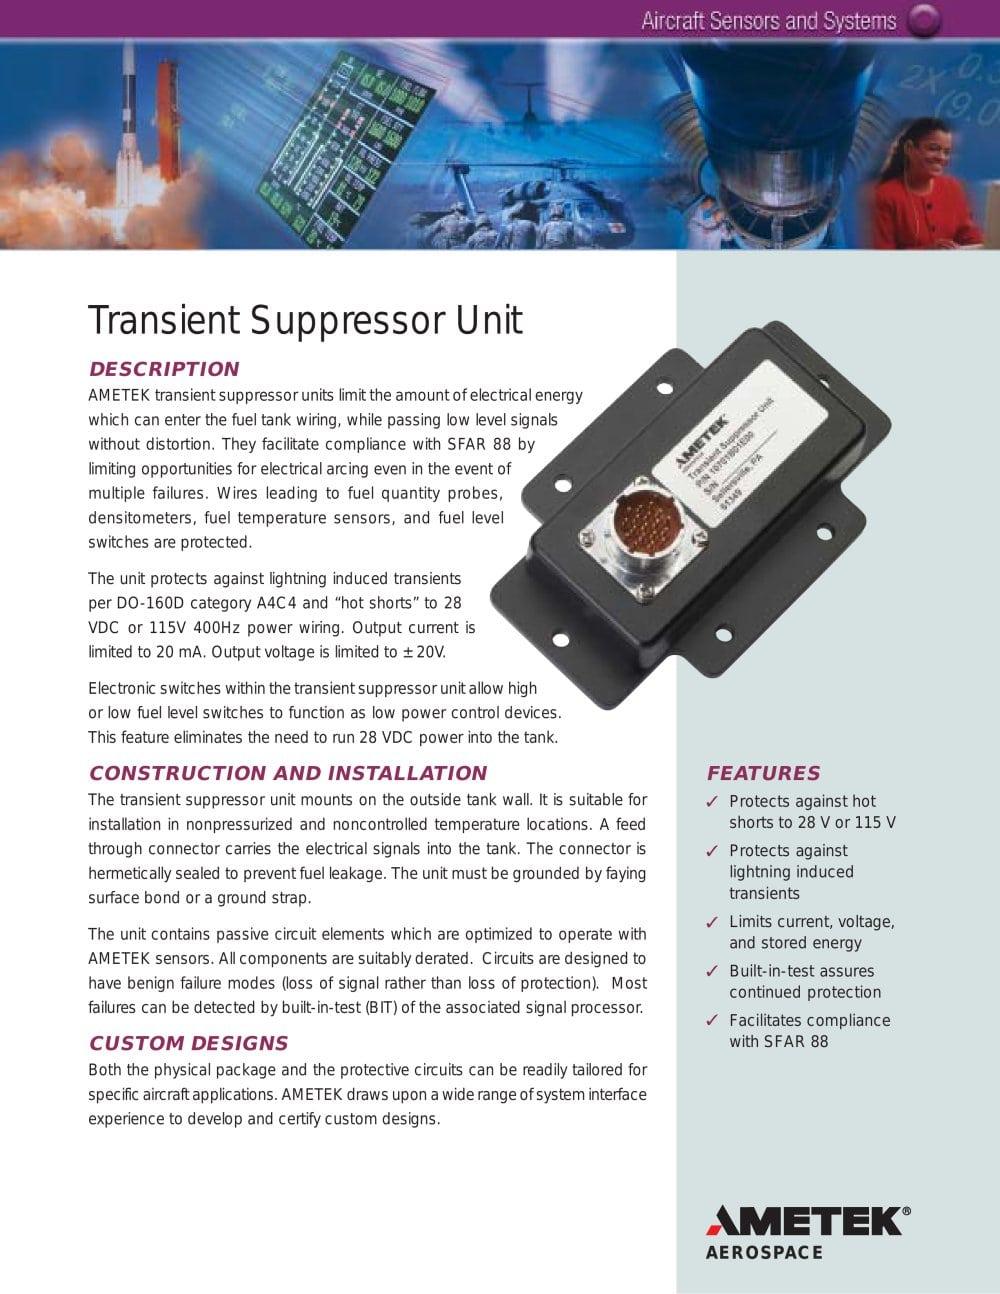 Surface Wiring System Pdf Electrical Diagrams Transient Suppressor Unit Ametek Fluid Management Systems At Home Depot